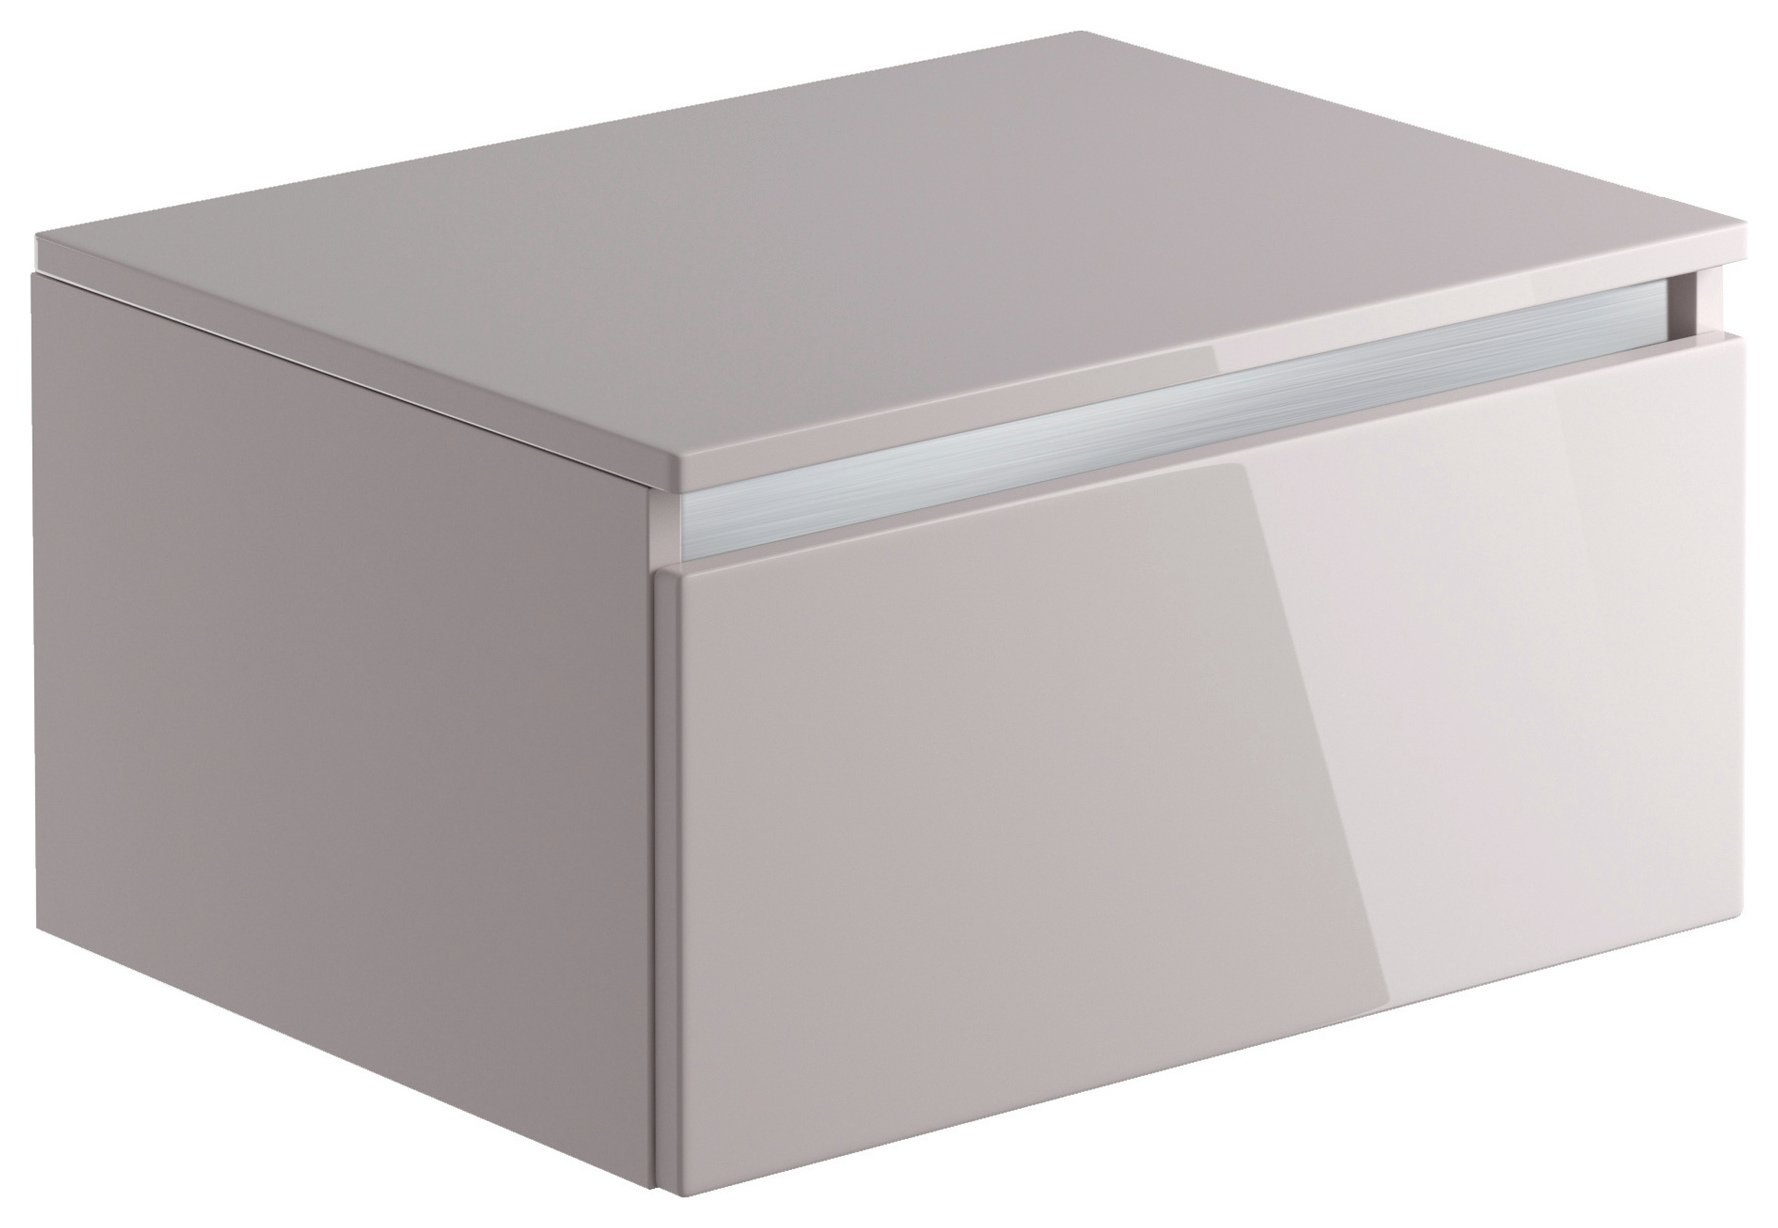 Lavari 1 Drawer Unit - Cashmere - 90cm